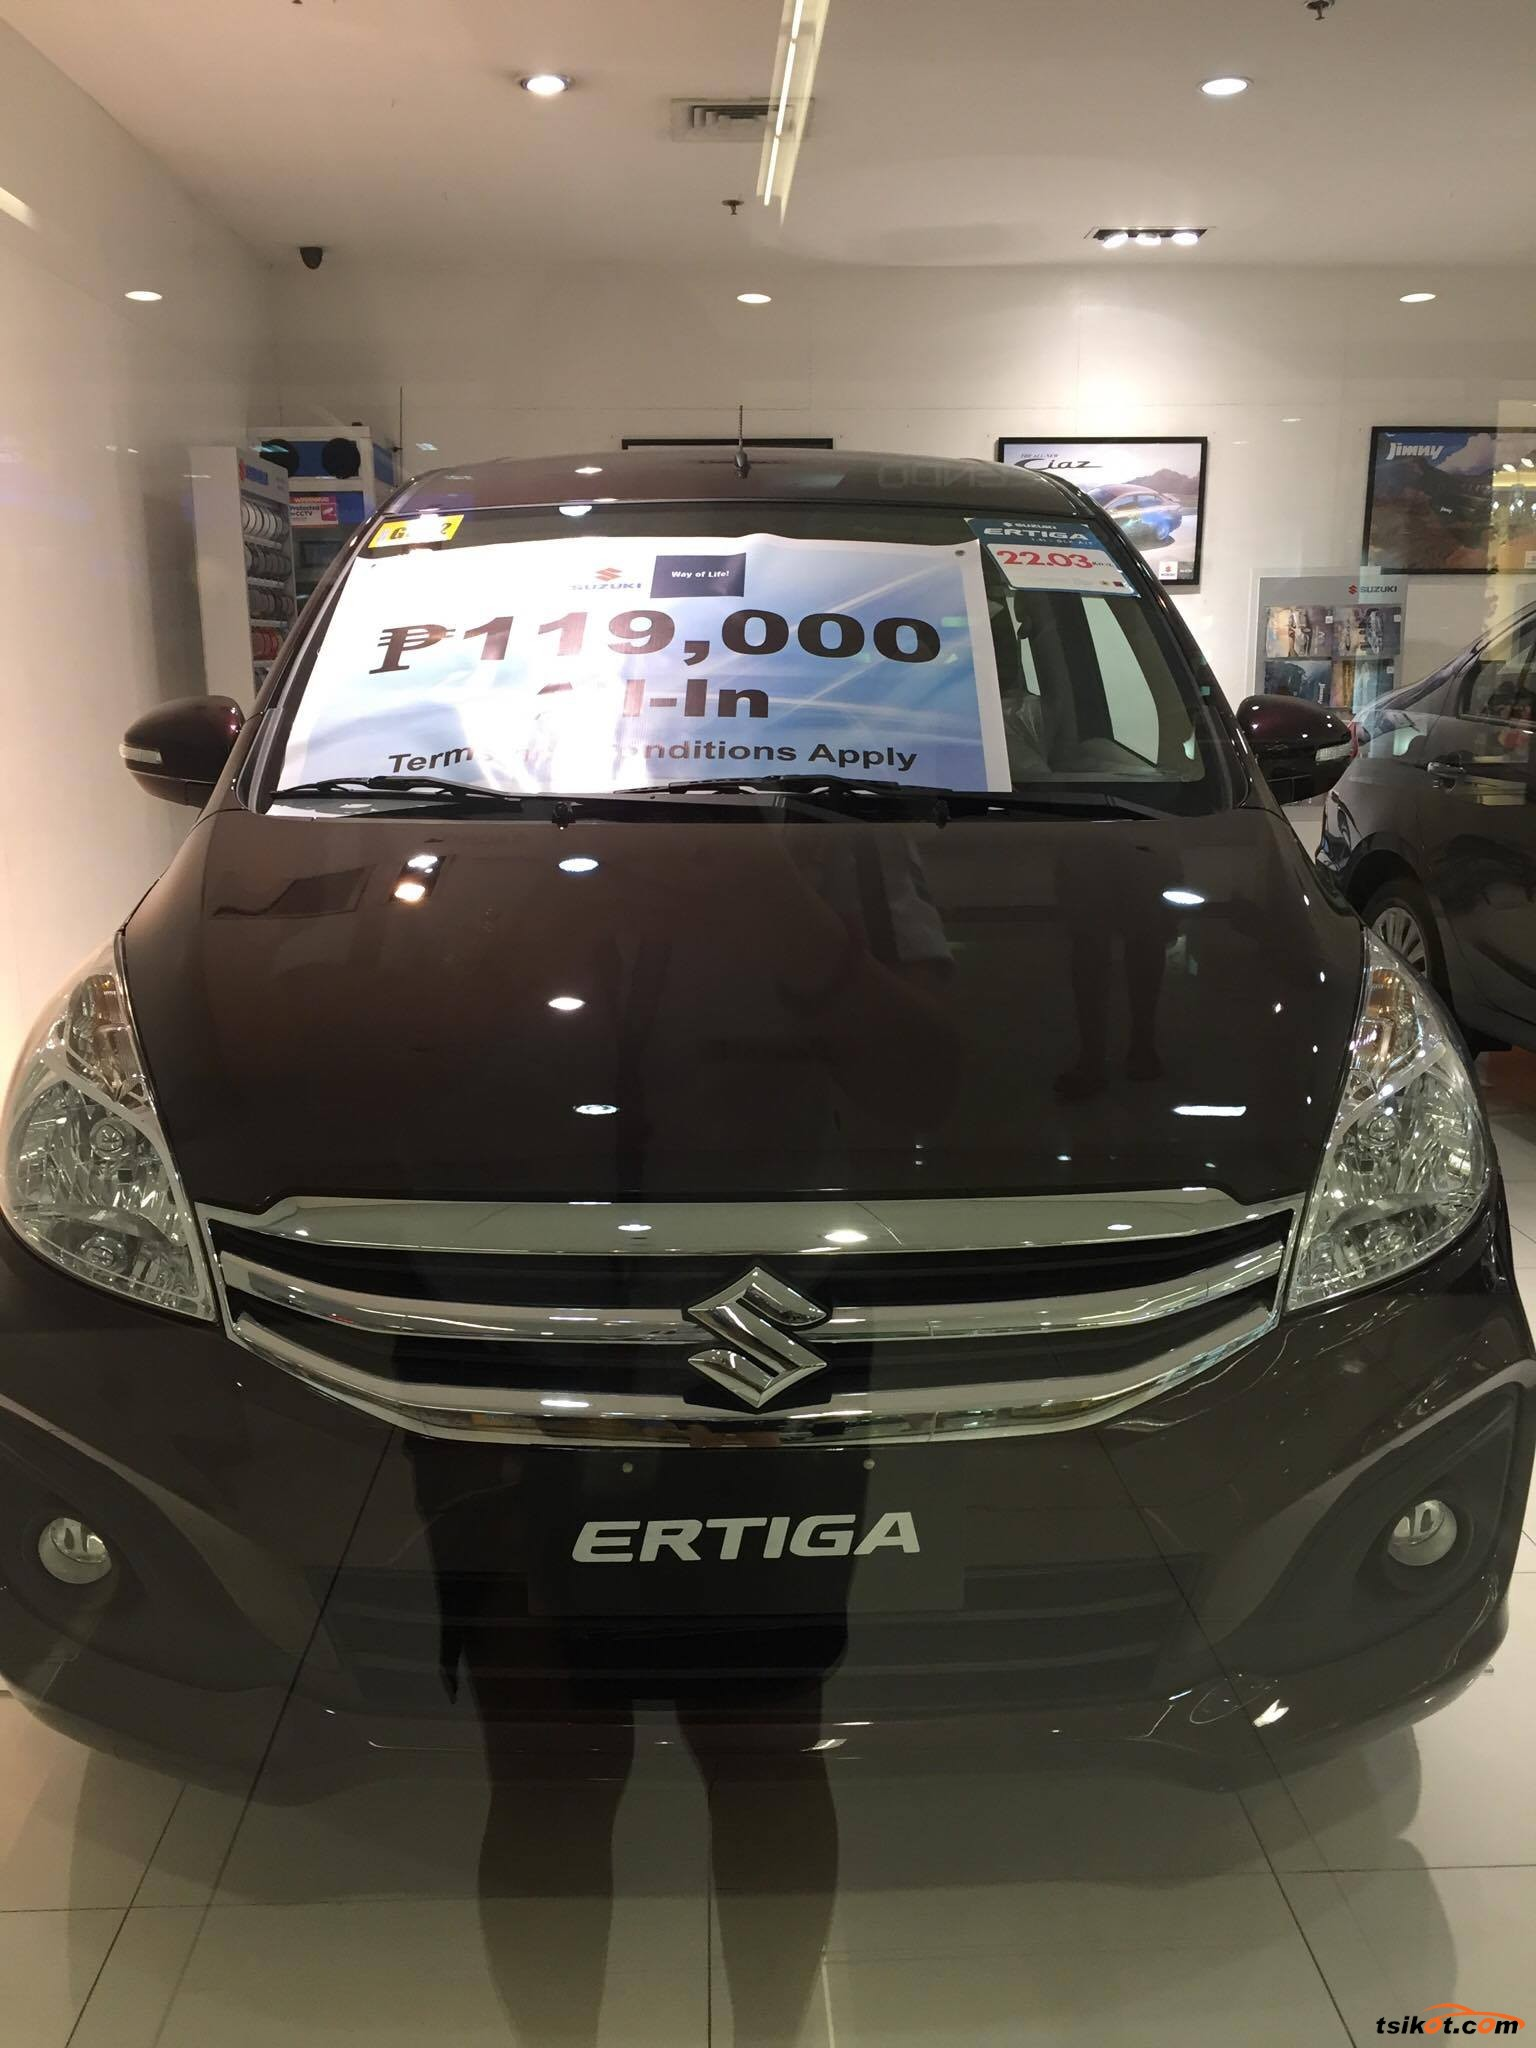 Suzuki Ertiga For Sale In The Philippines 2003 Aerio Gs Sedan Electric Yellow Click To See Large 2017 1